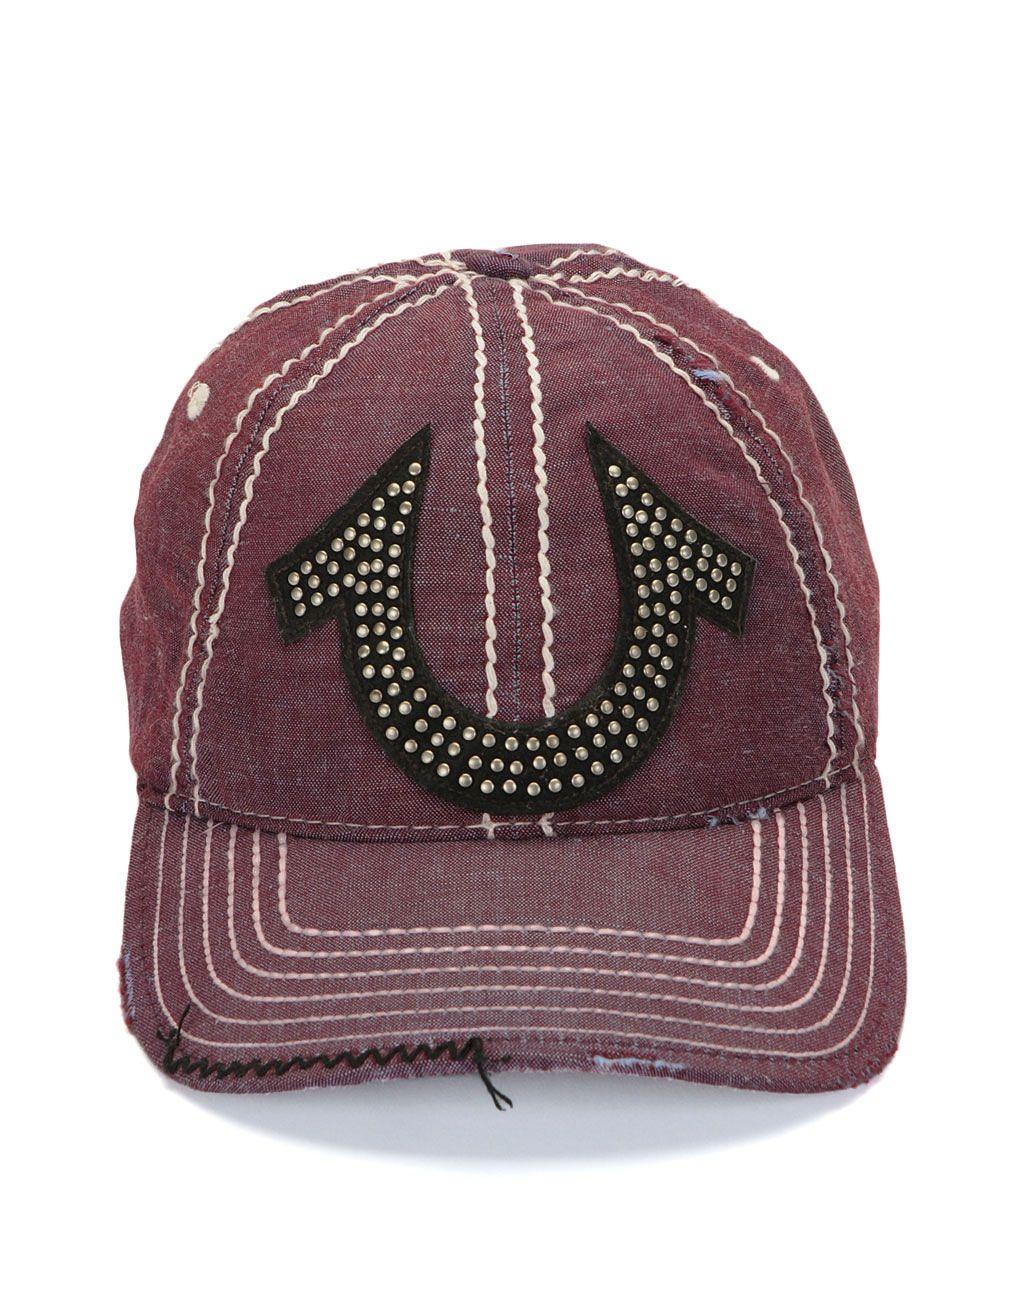 true religion hats....love them!  0a4bbac907aa